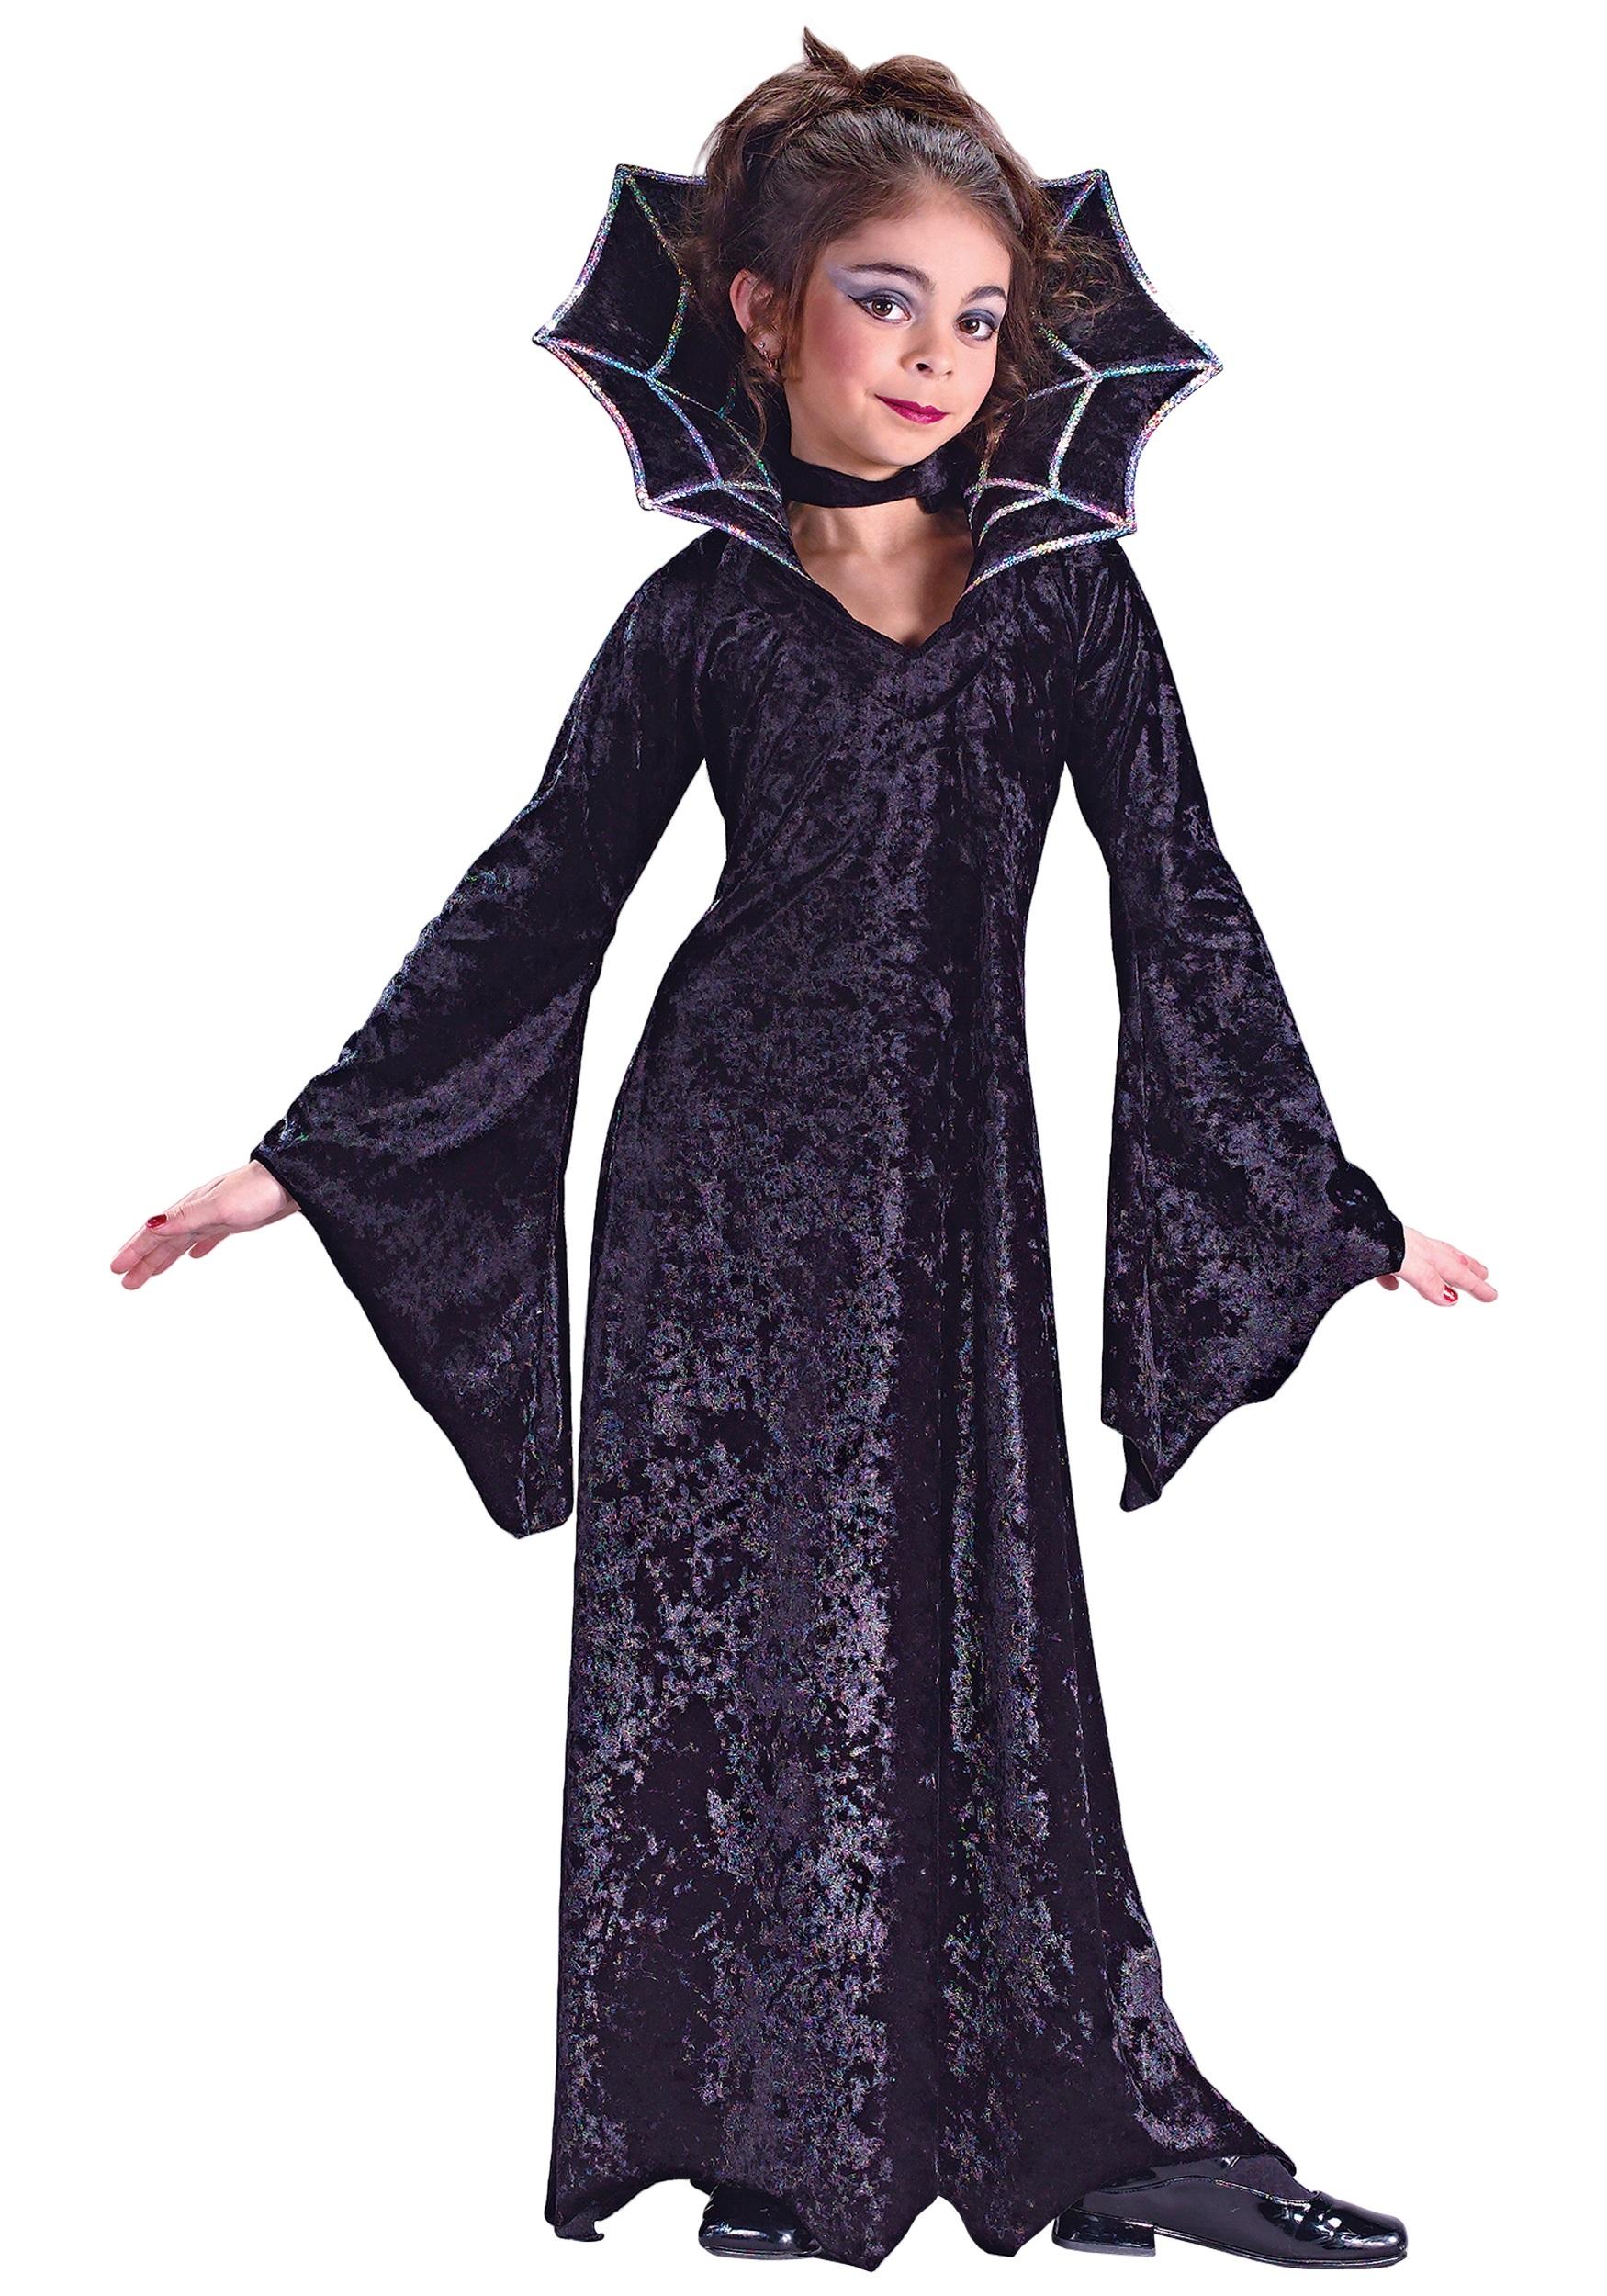 child-spiderella-costume